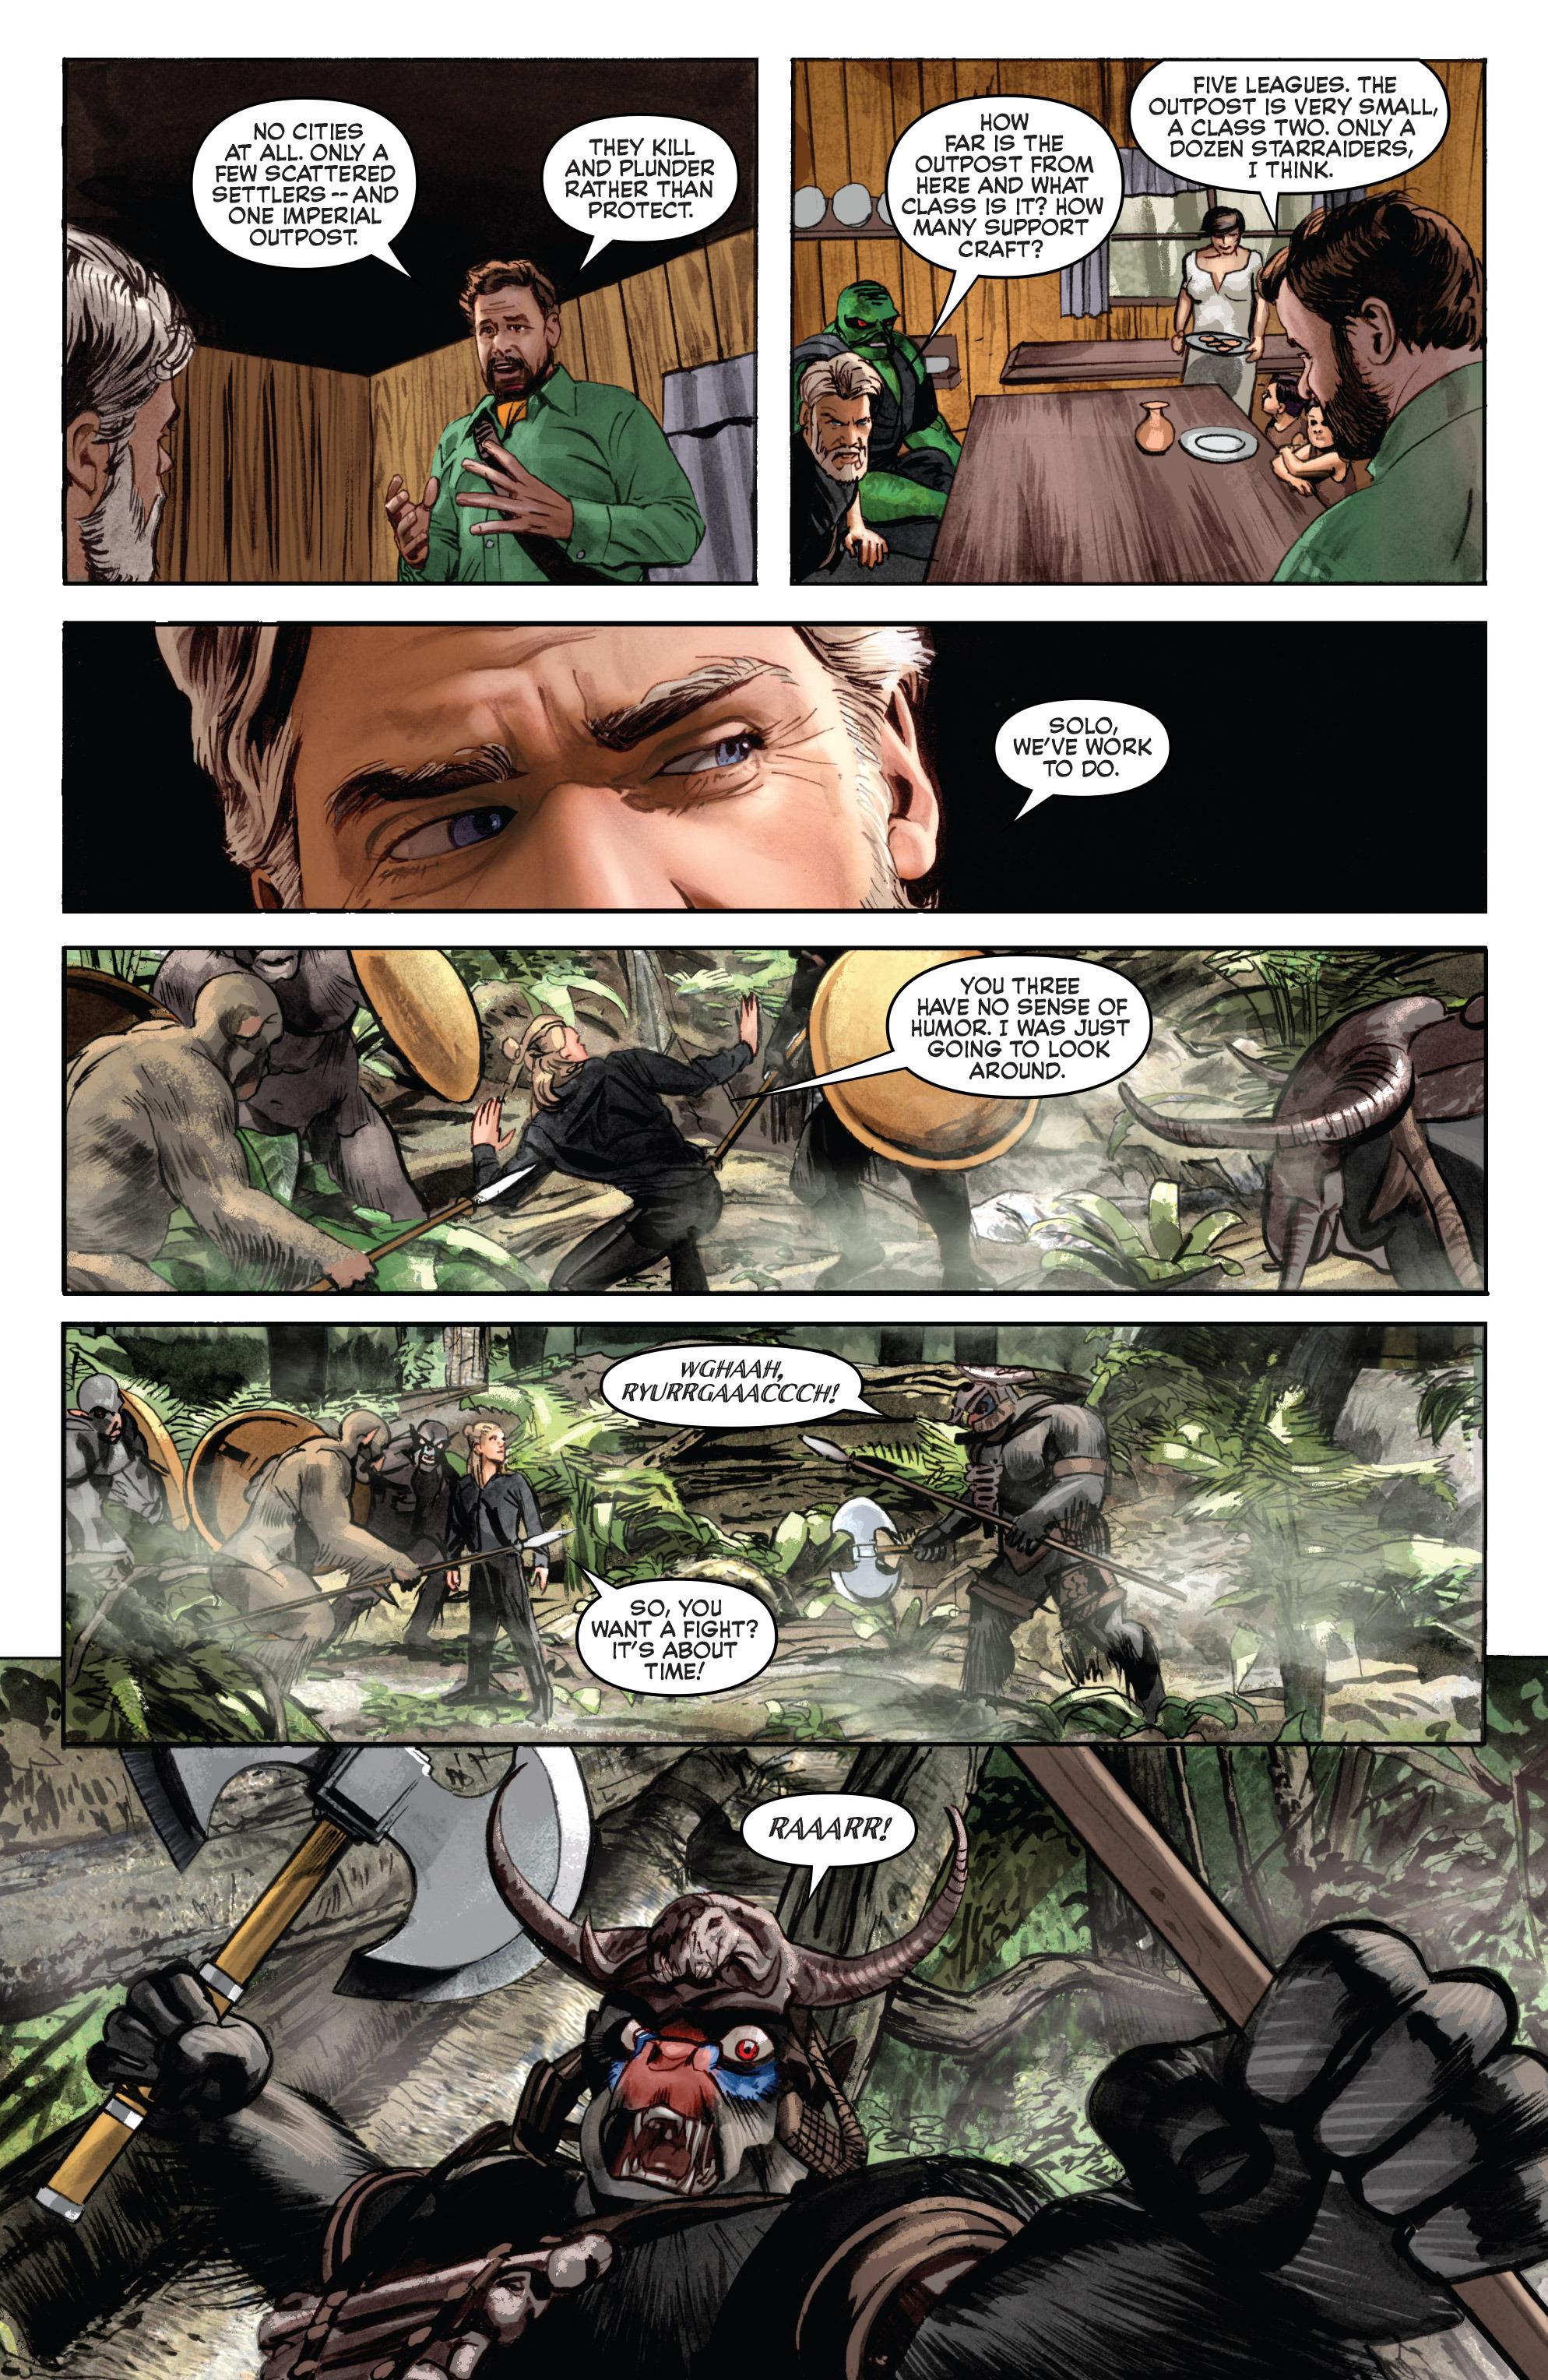 THE STAR WARS comic (2015, Marvel edition) Vol.7 21